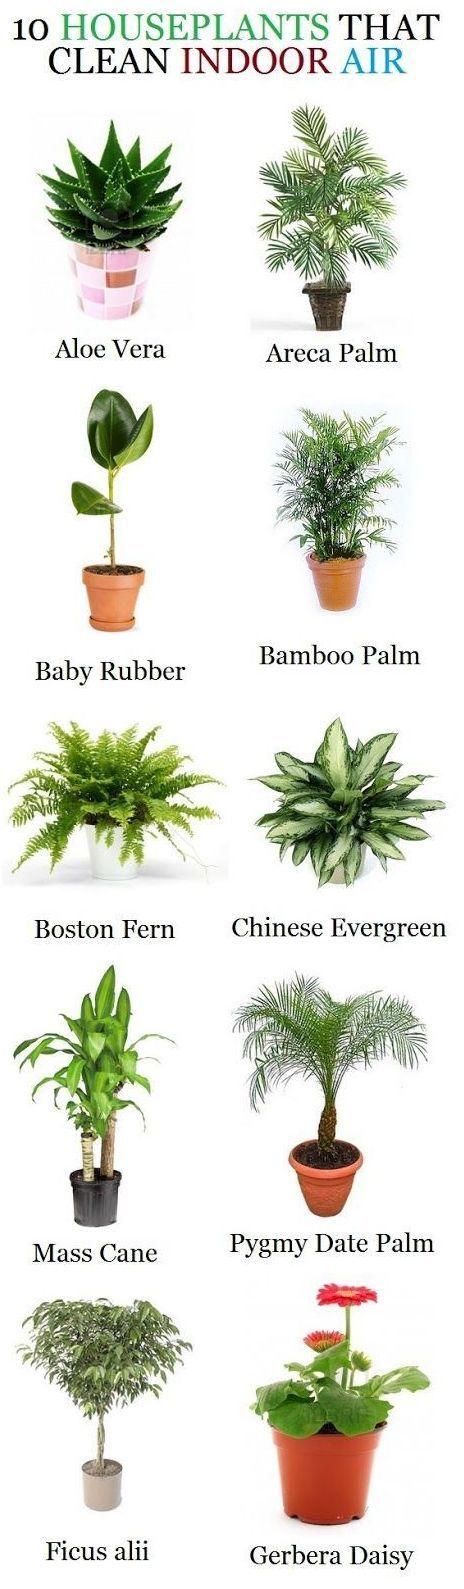 Houseplants that clean indoor air